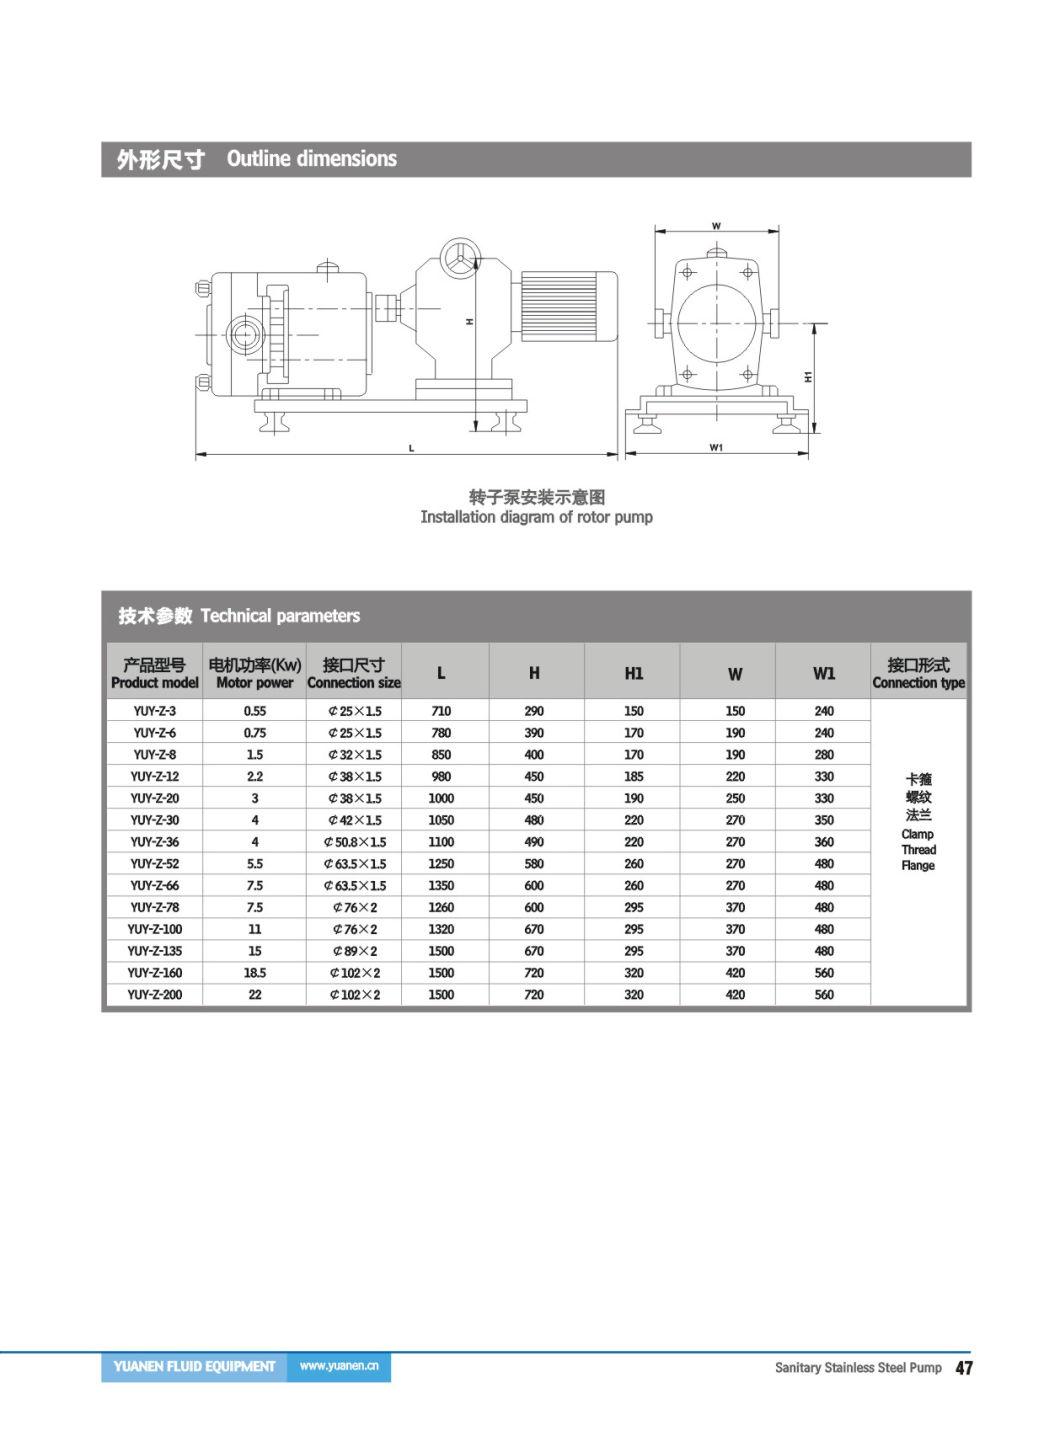 Stainless Steel Lobe Rotor Pump with Variator